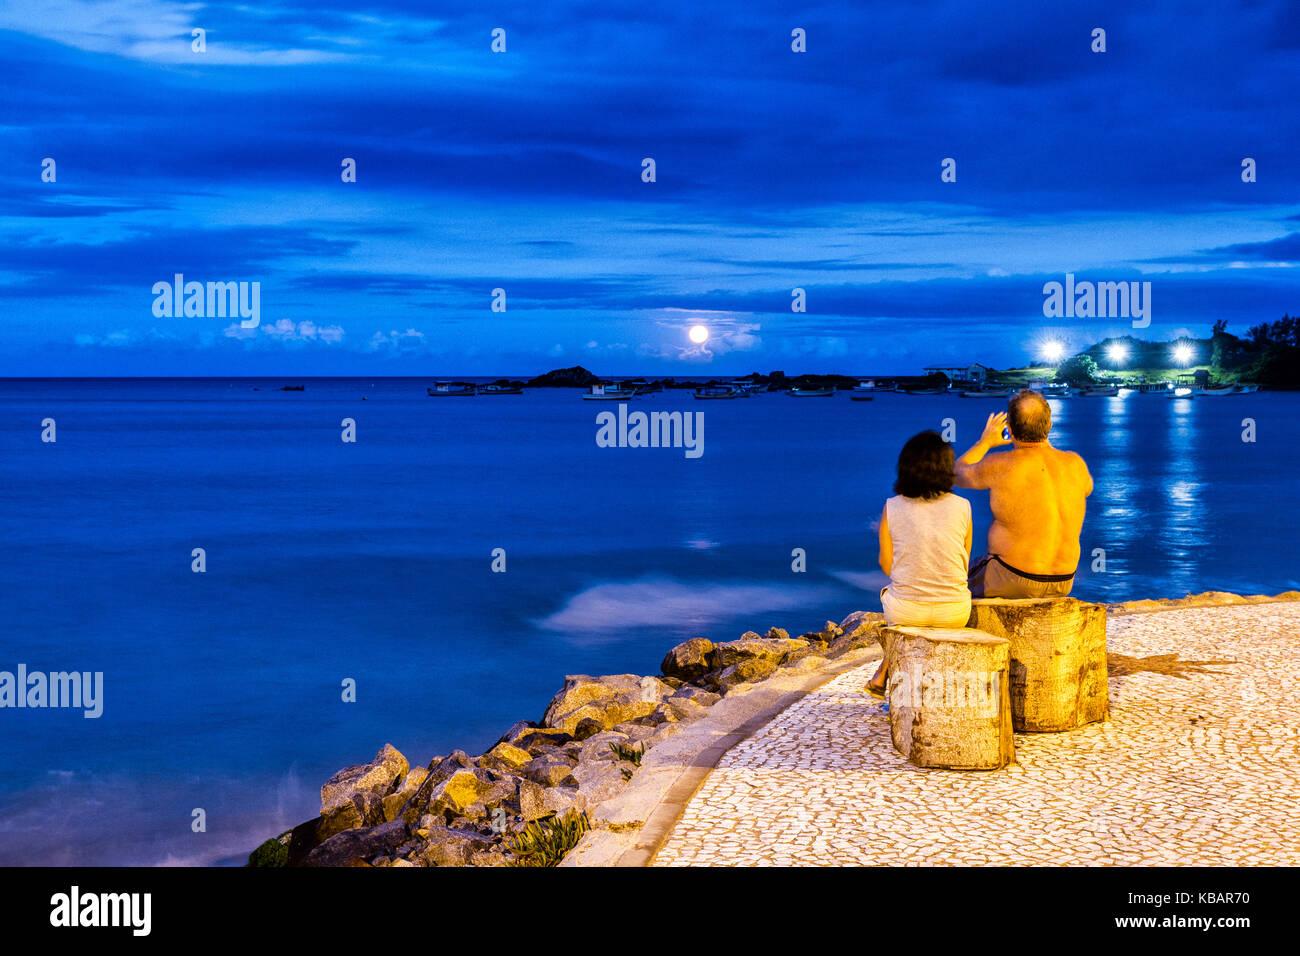 Mature couple watching full moon rising at Armacao Beach at dusk. Florianopolis, Santa Catarina, Brazil. - Stock Image